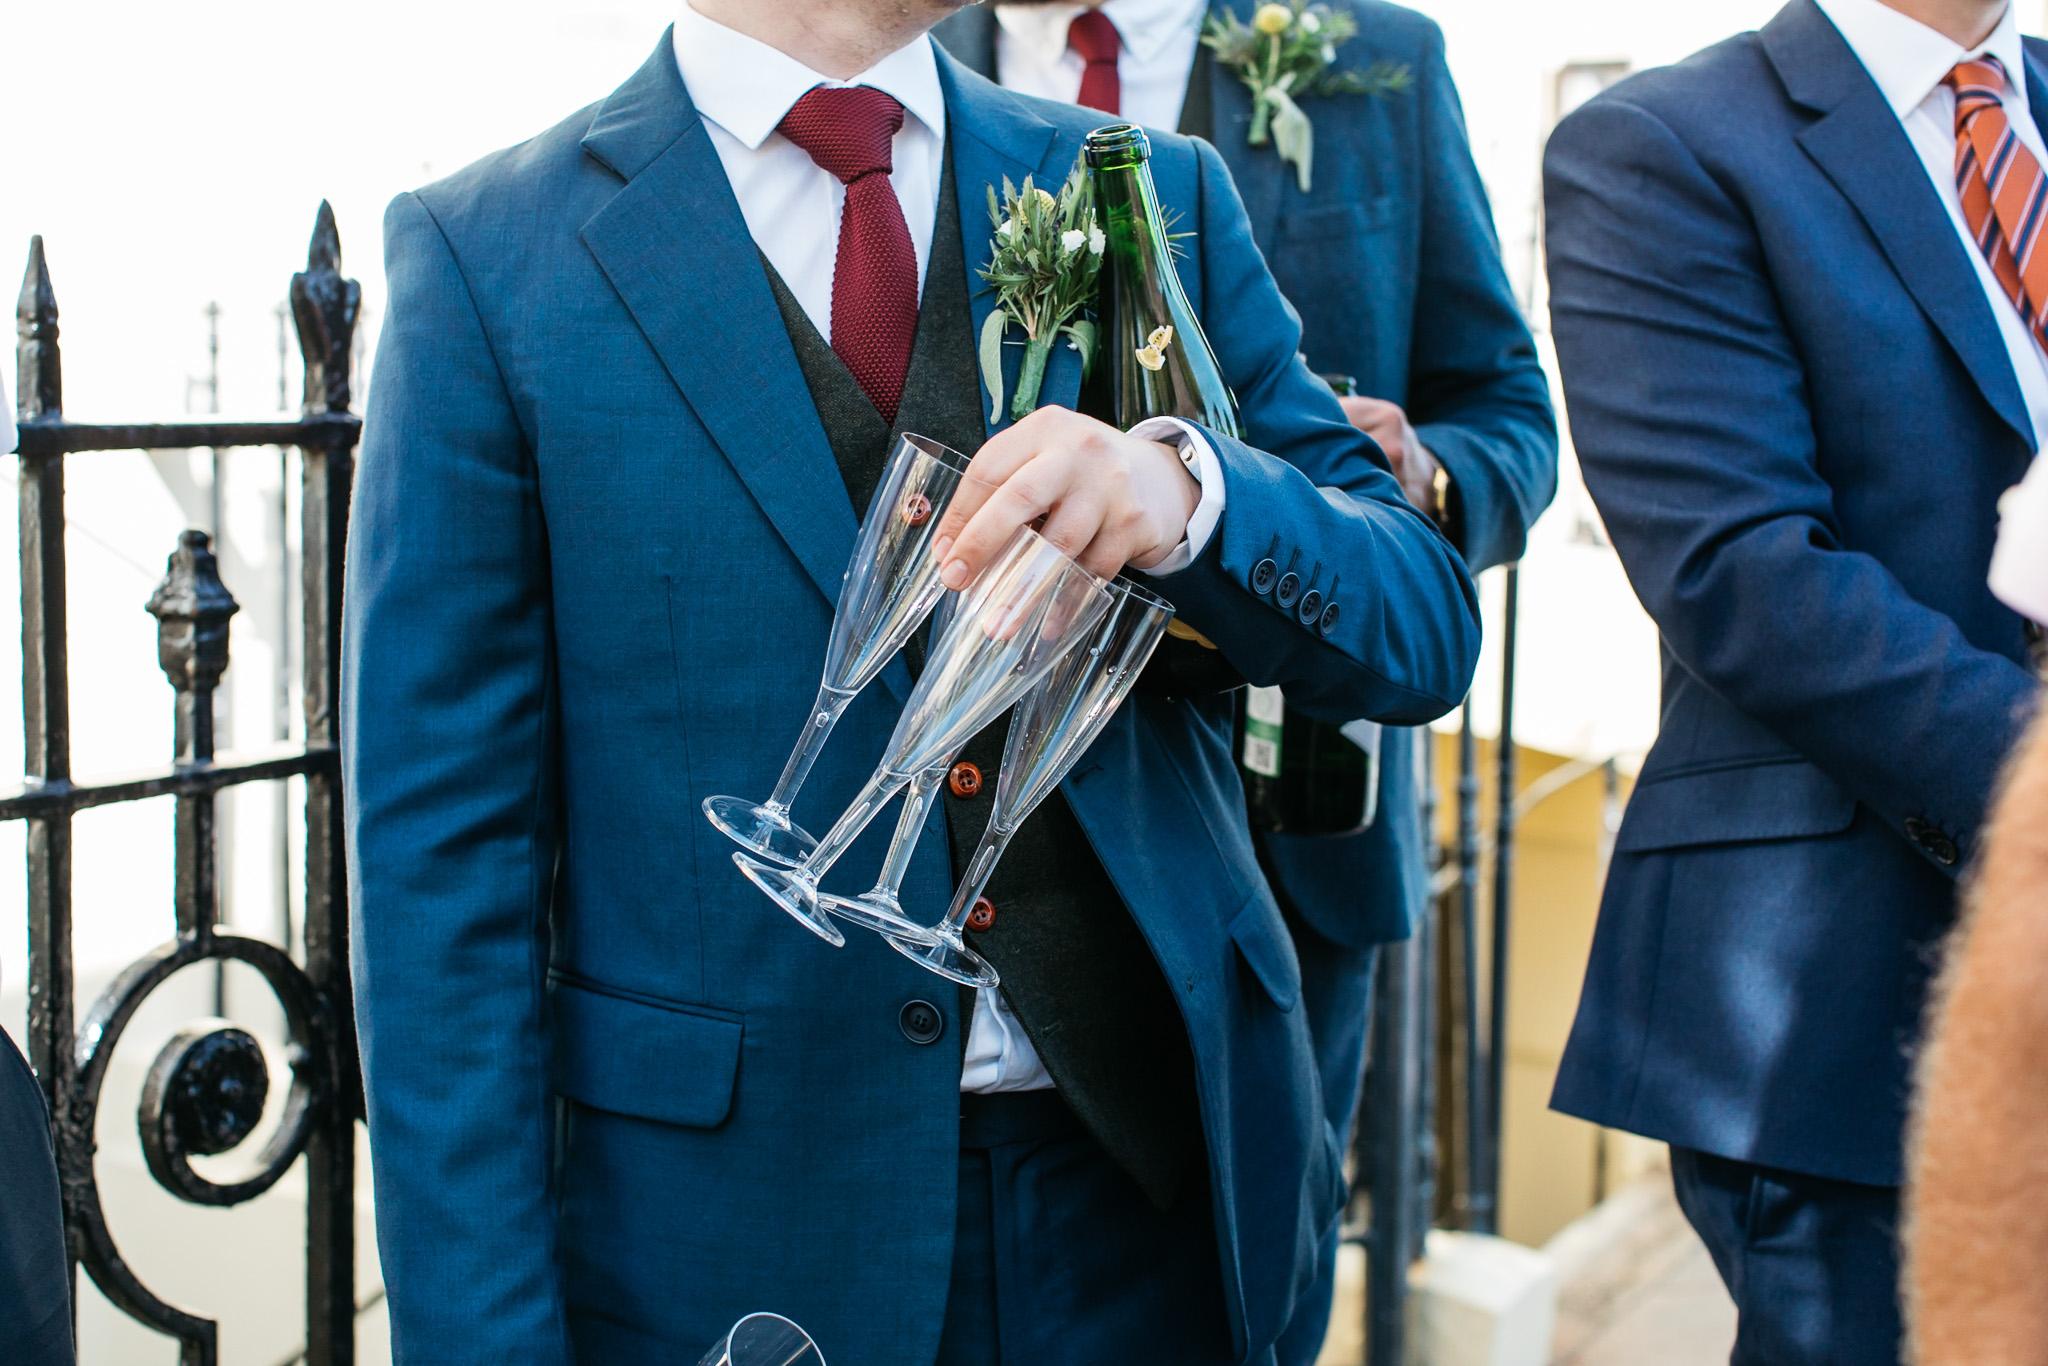 st_andrews_fabrica_brighton_wedding_590.jpg